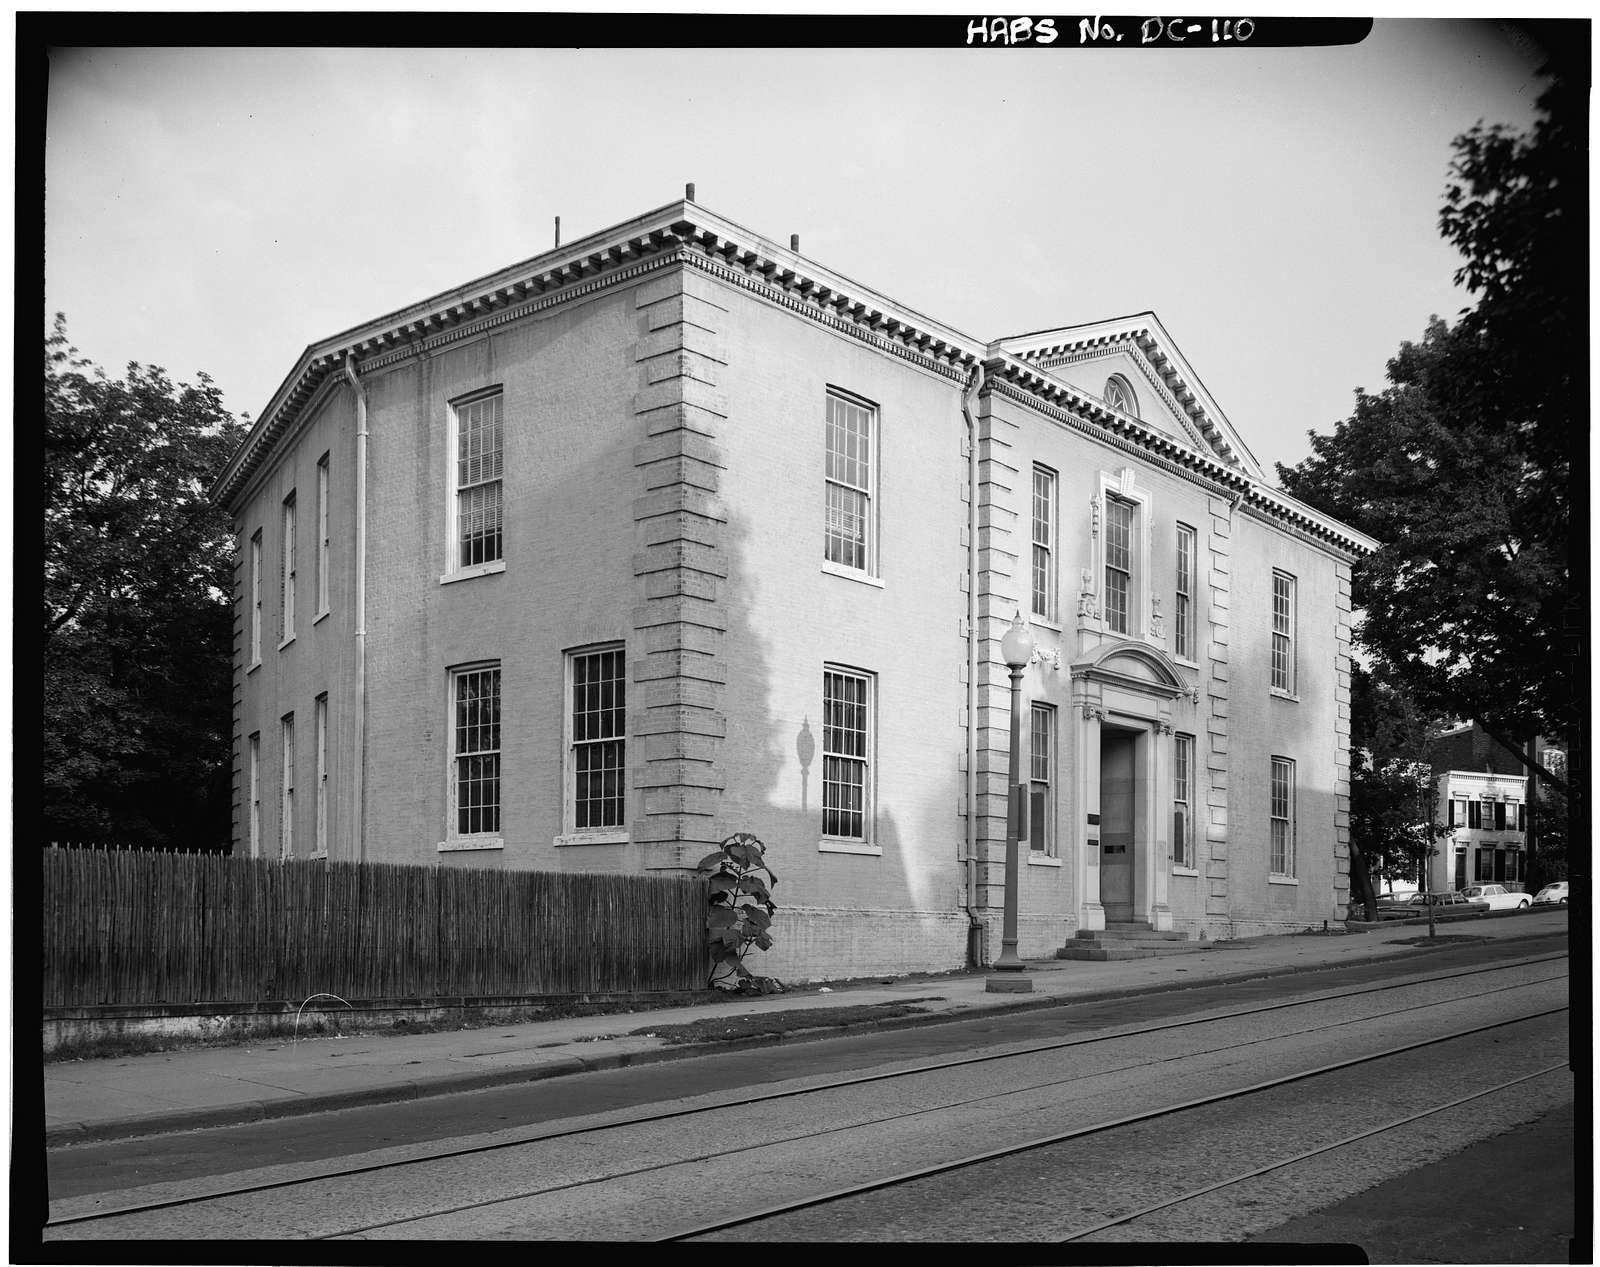 West Georgetown School, 1640 Wisconsin Avenue Northwest, Washington, District of Columbia, DC